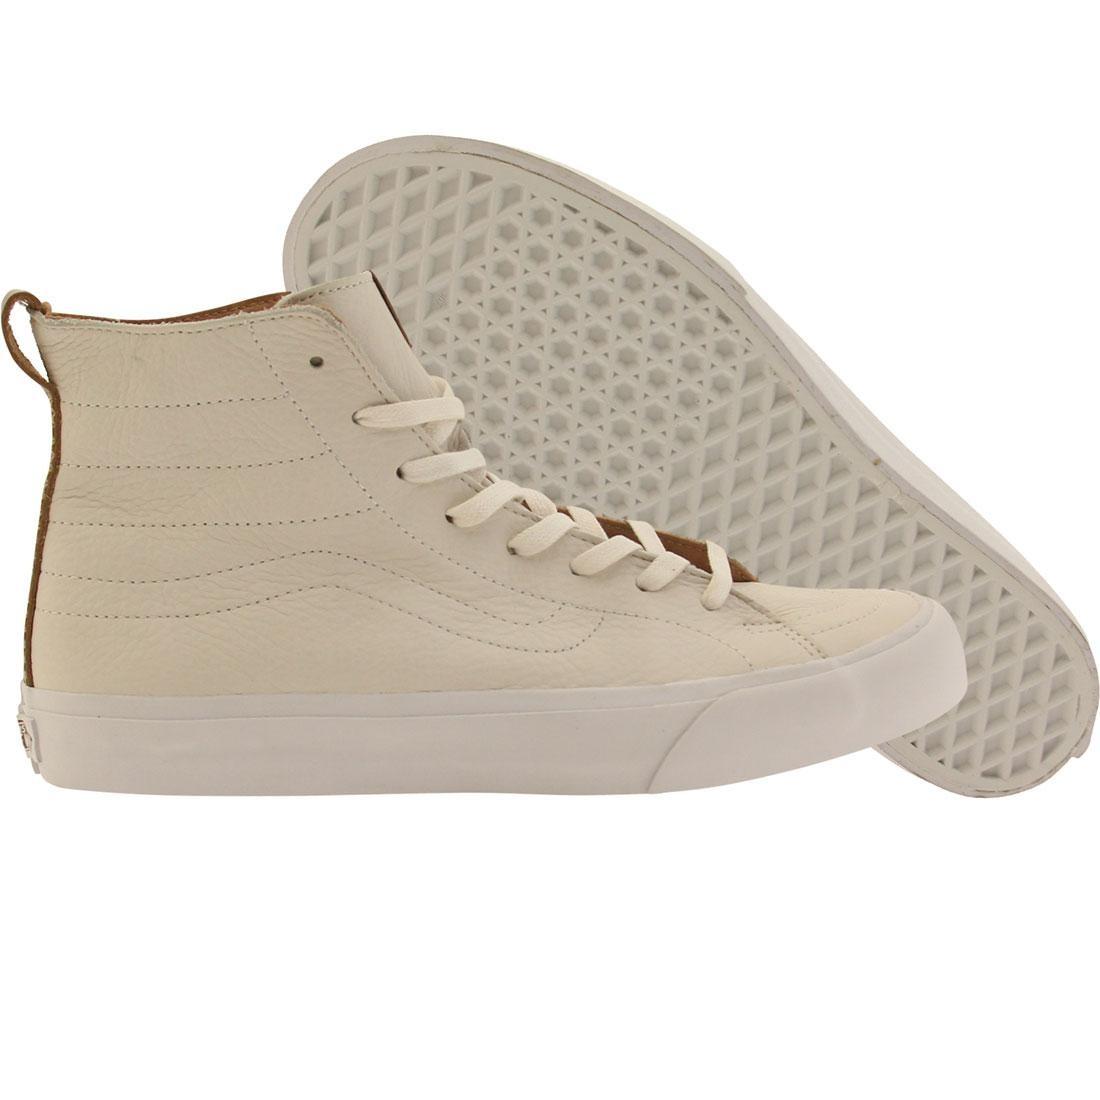 Vans Men Sk8-Hi Deconstructed California - Premium Leather (white / winter)